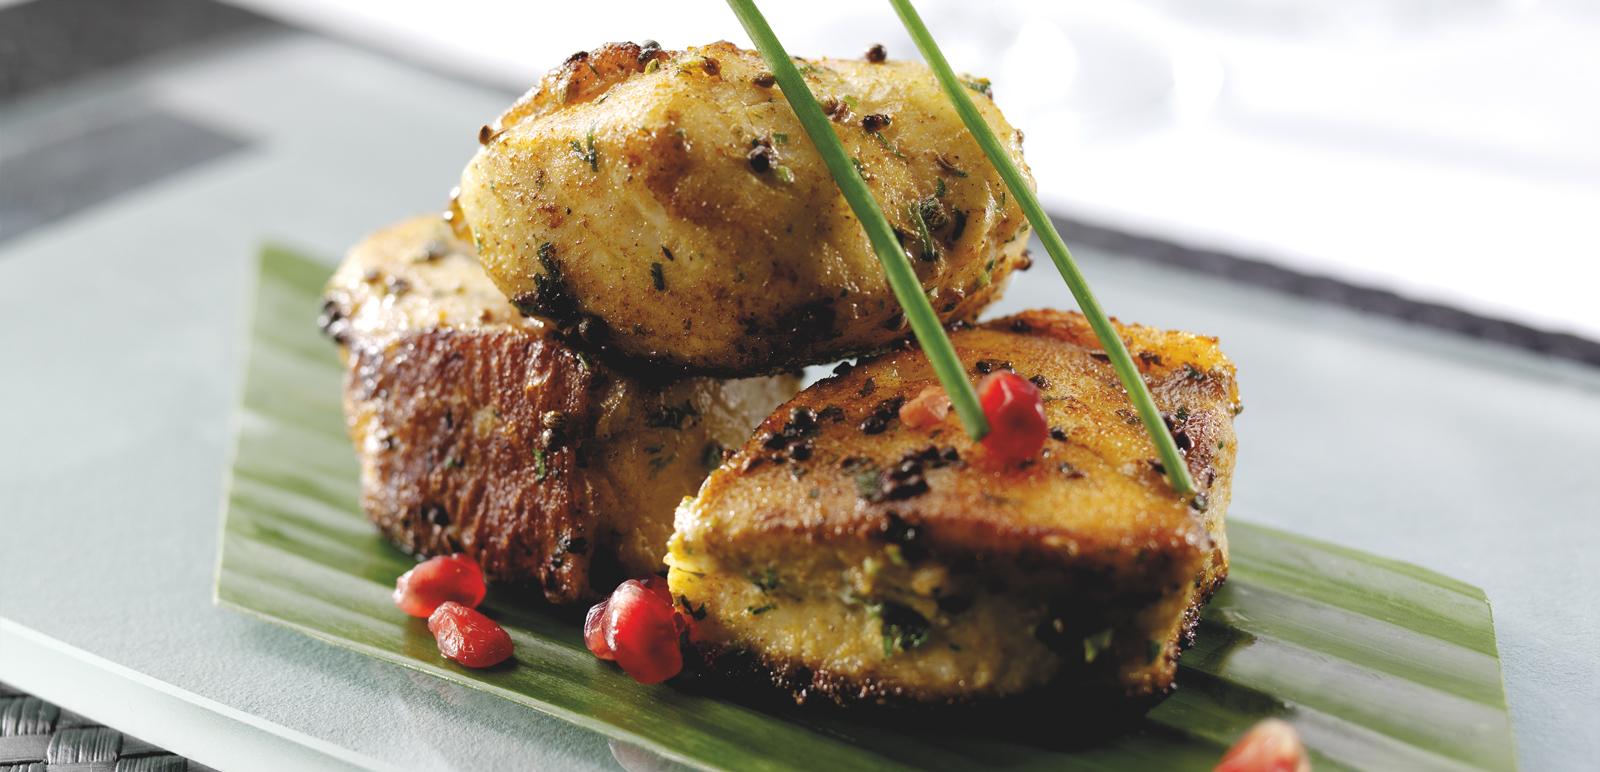 koloshi-indian-restaurant-cheltenham-3